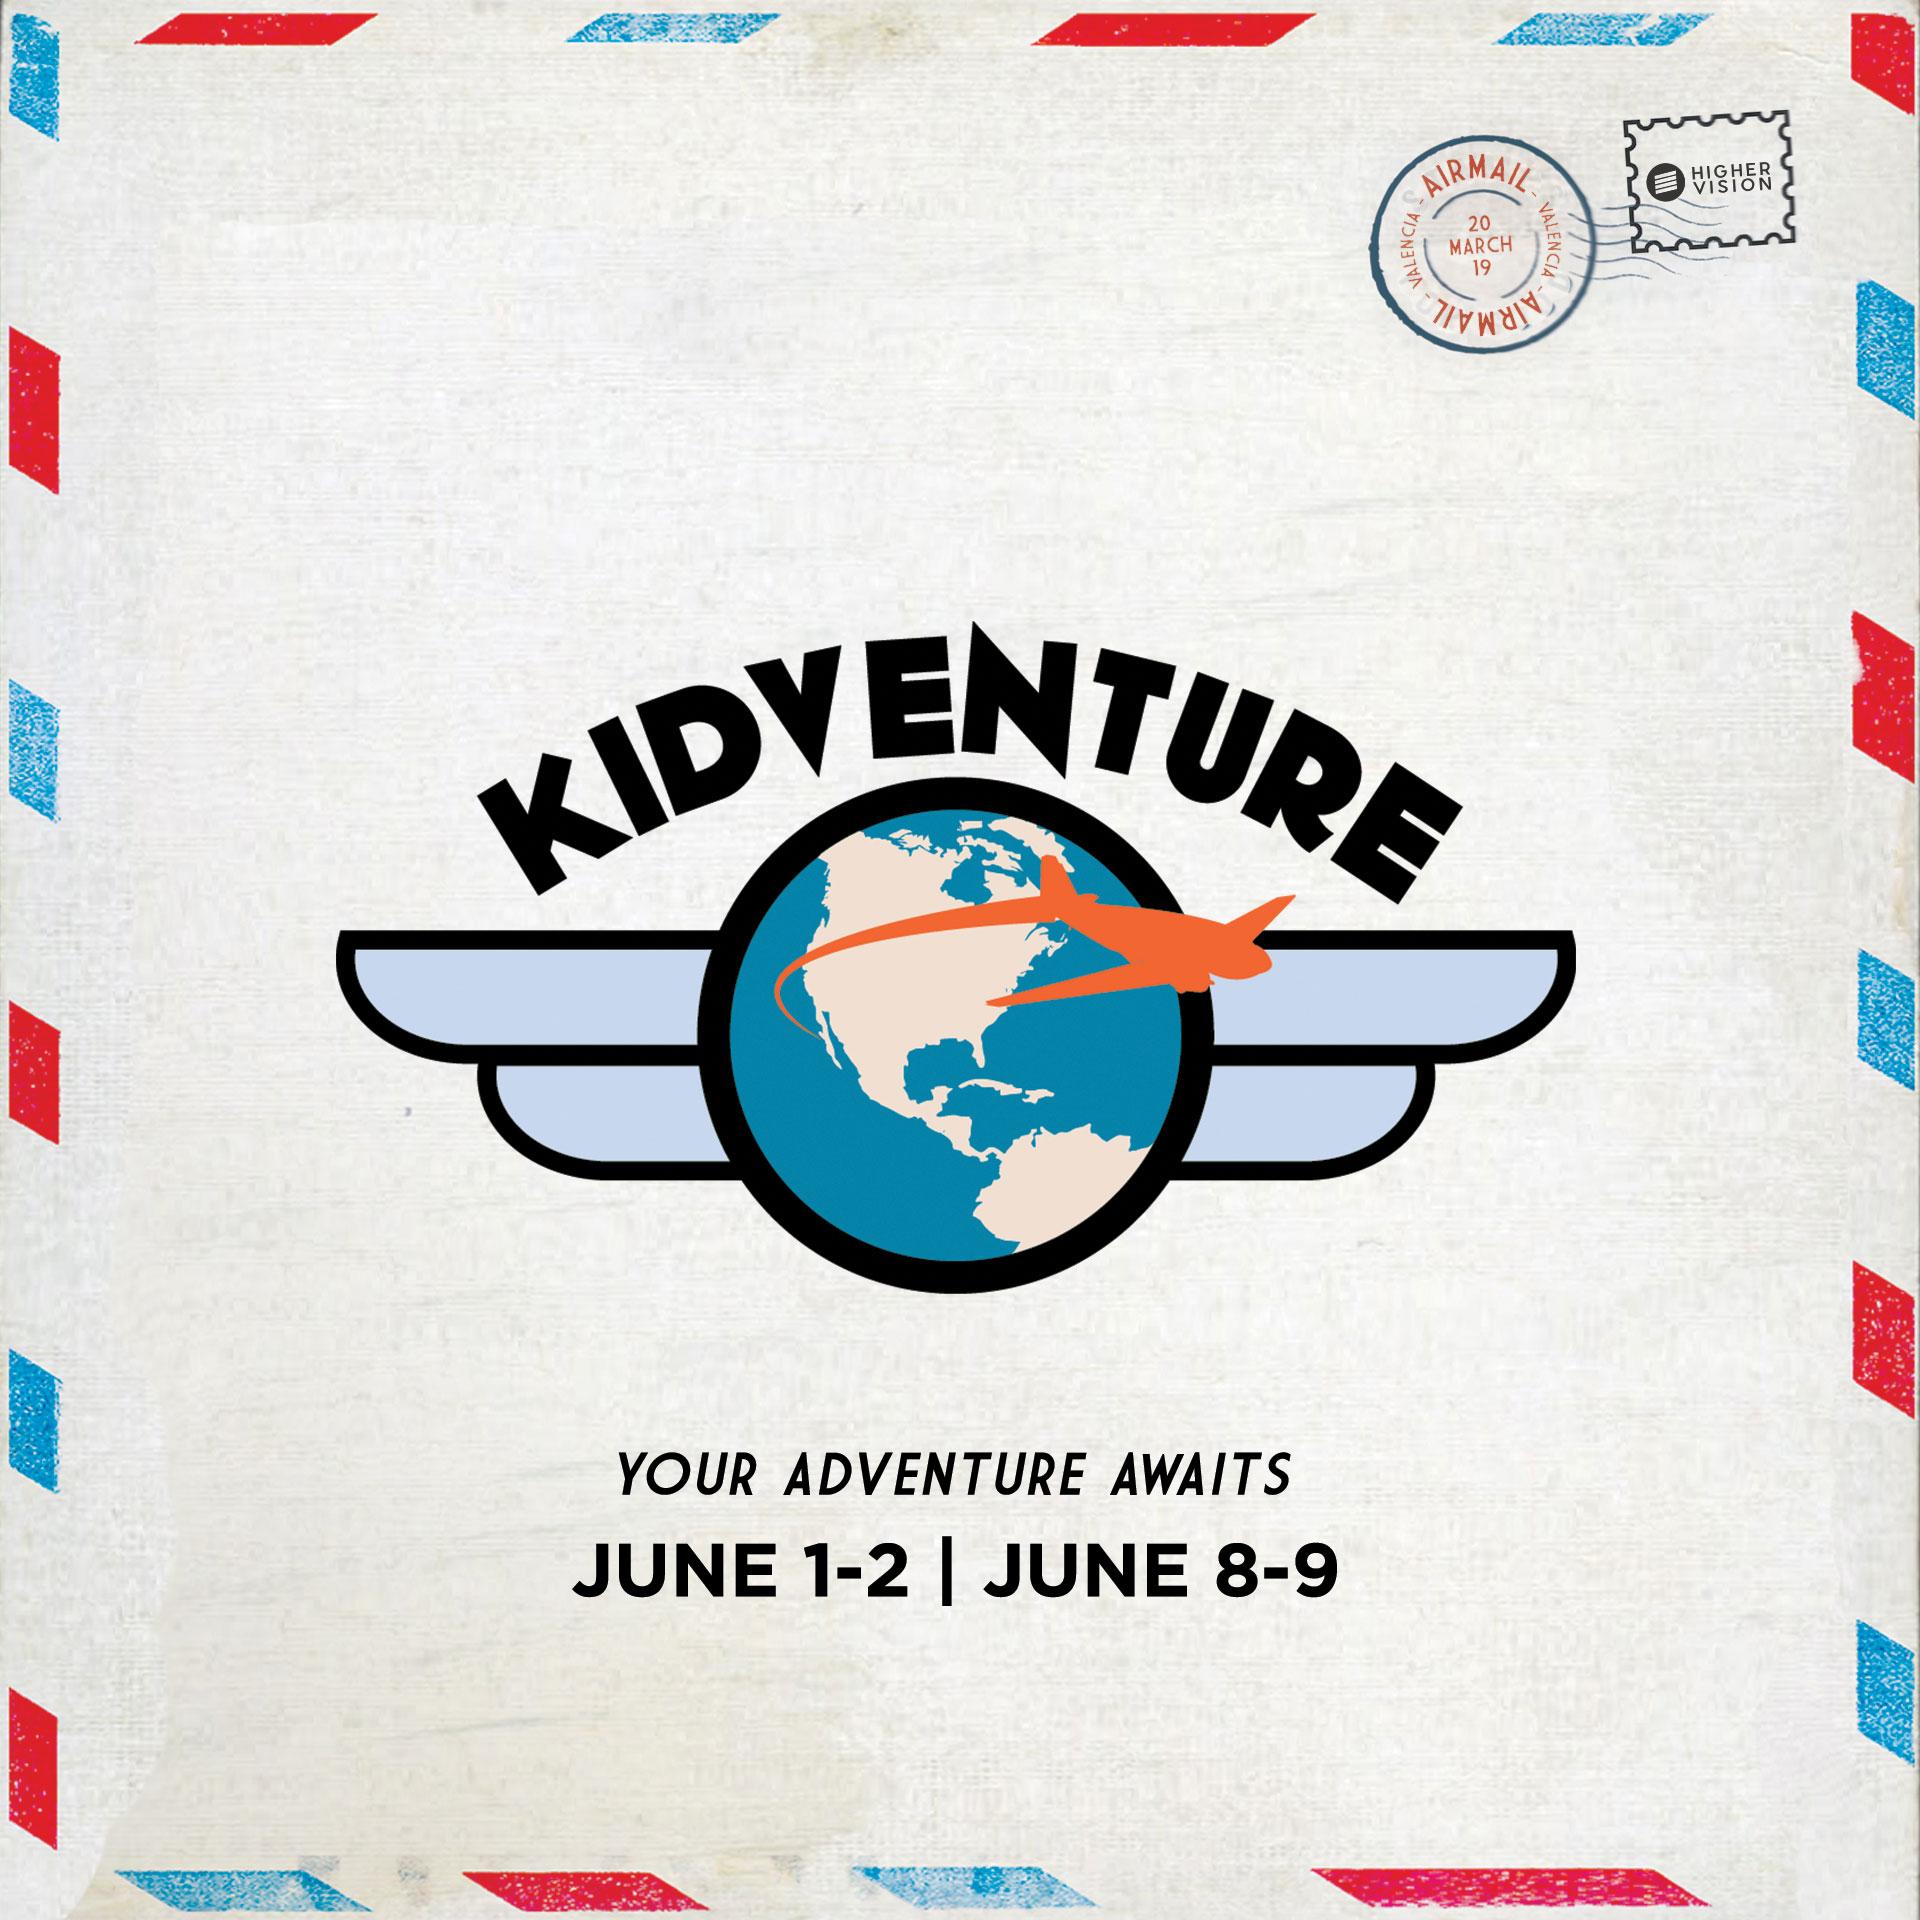 KidventureSquareJune.jpg